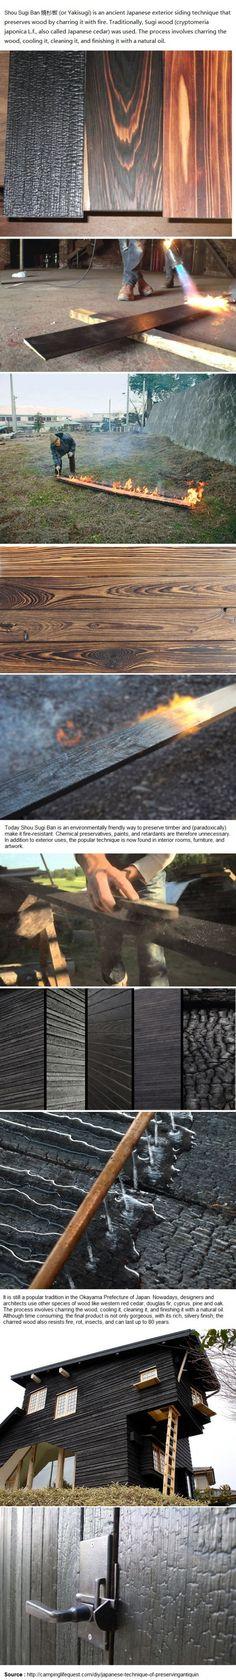 técnica japonesa de preservar, madera antigüedades